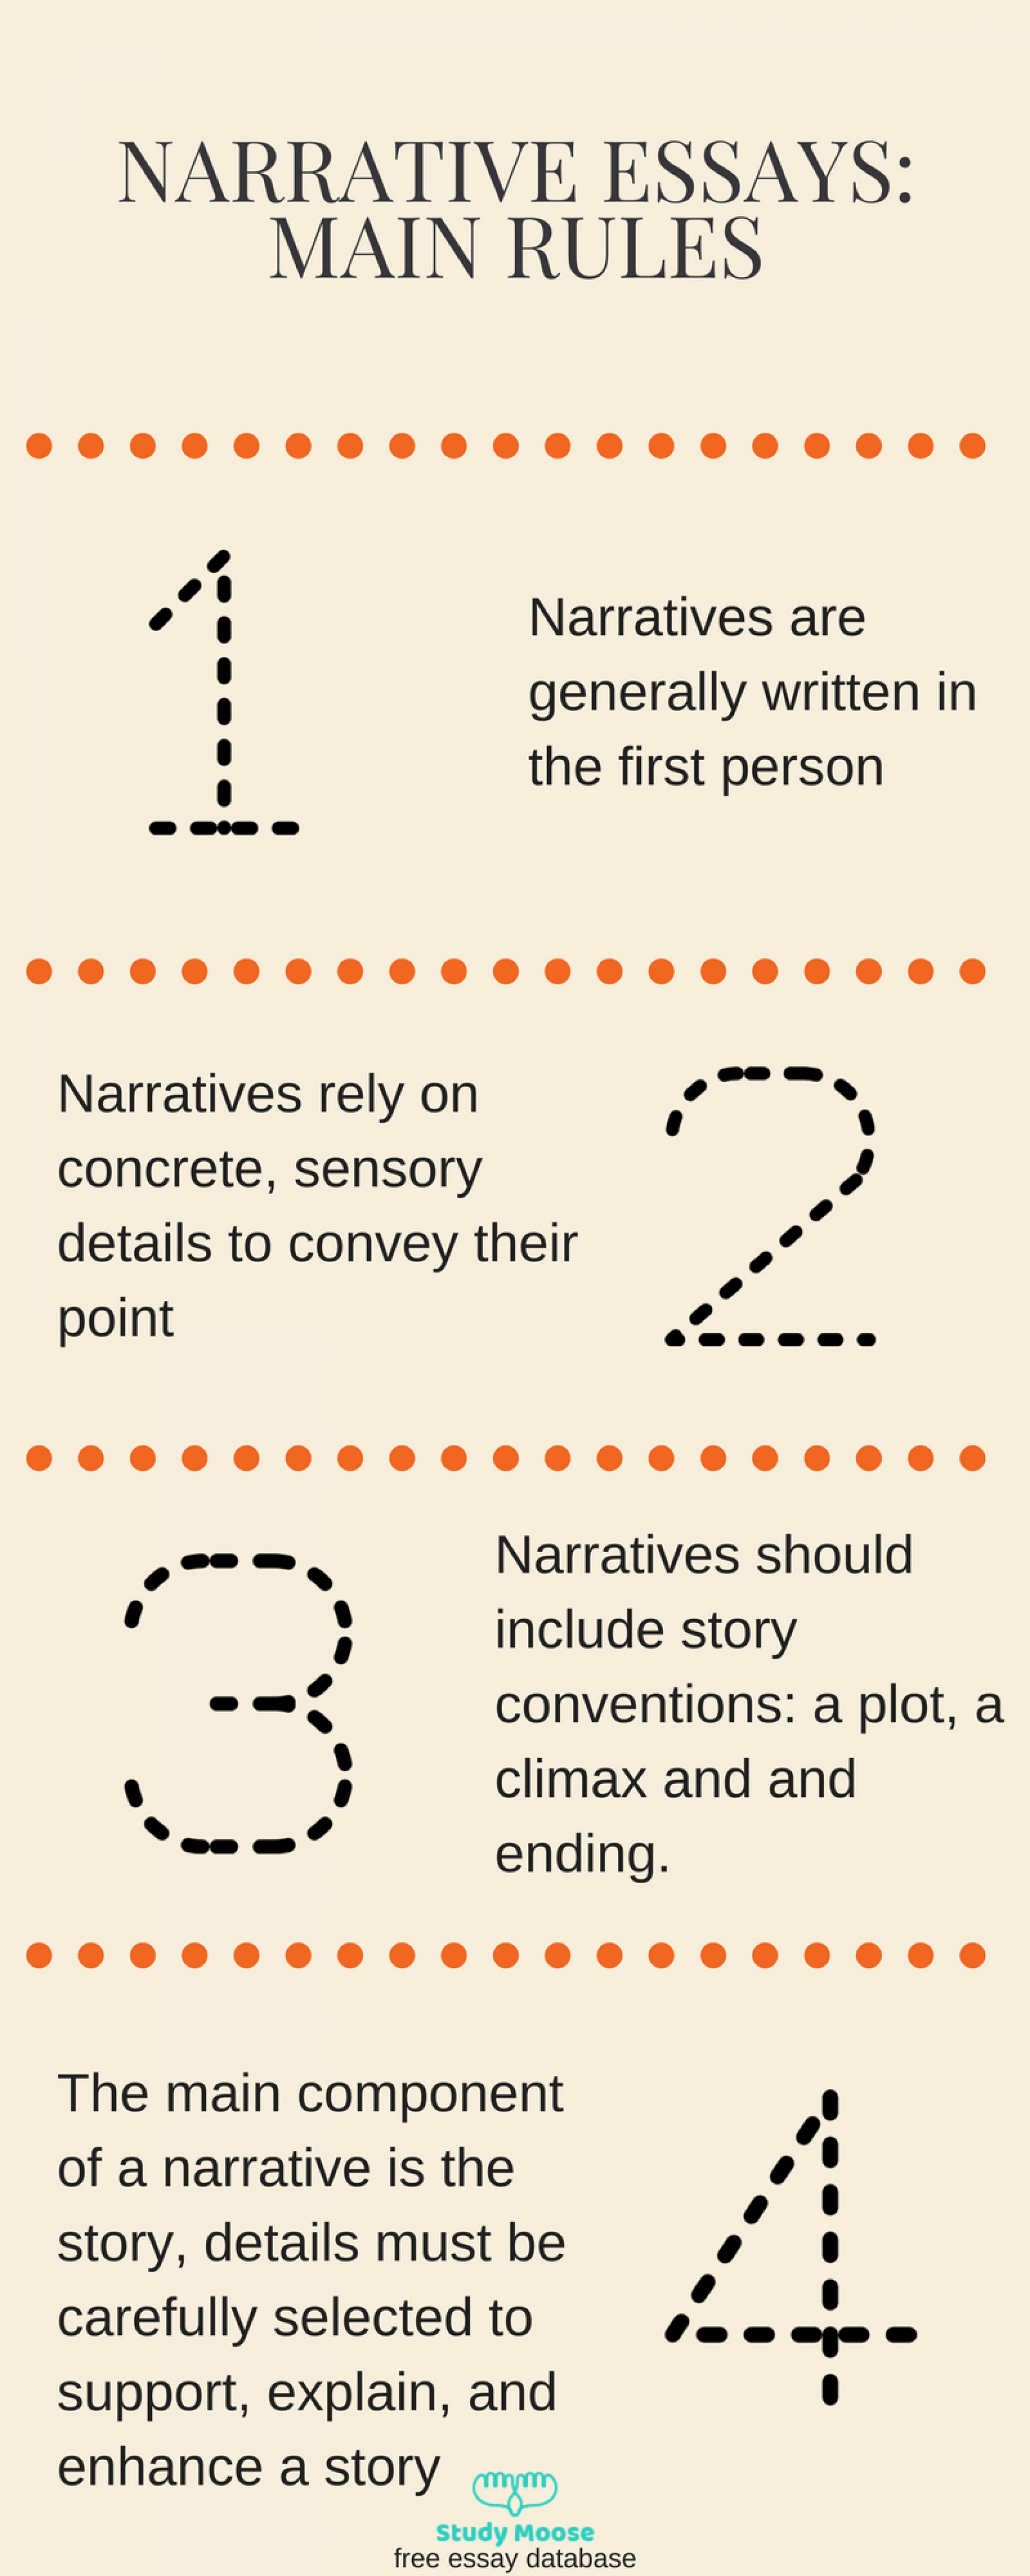 004 How To Start Narrative Essay Do You Write Impressive A Personal Thesis 1920